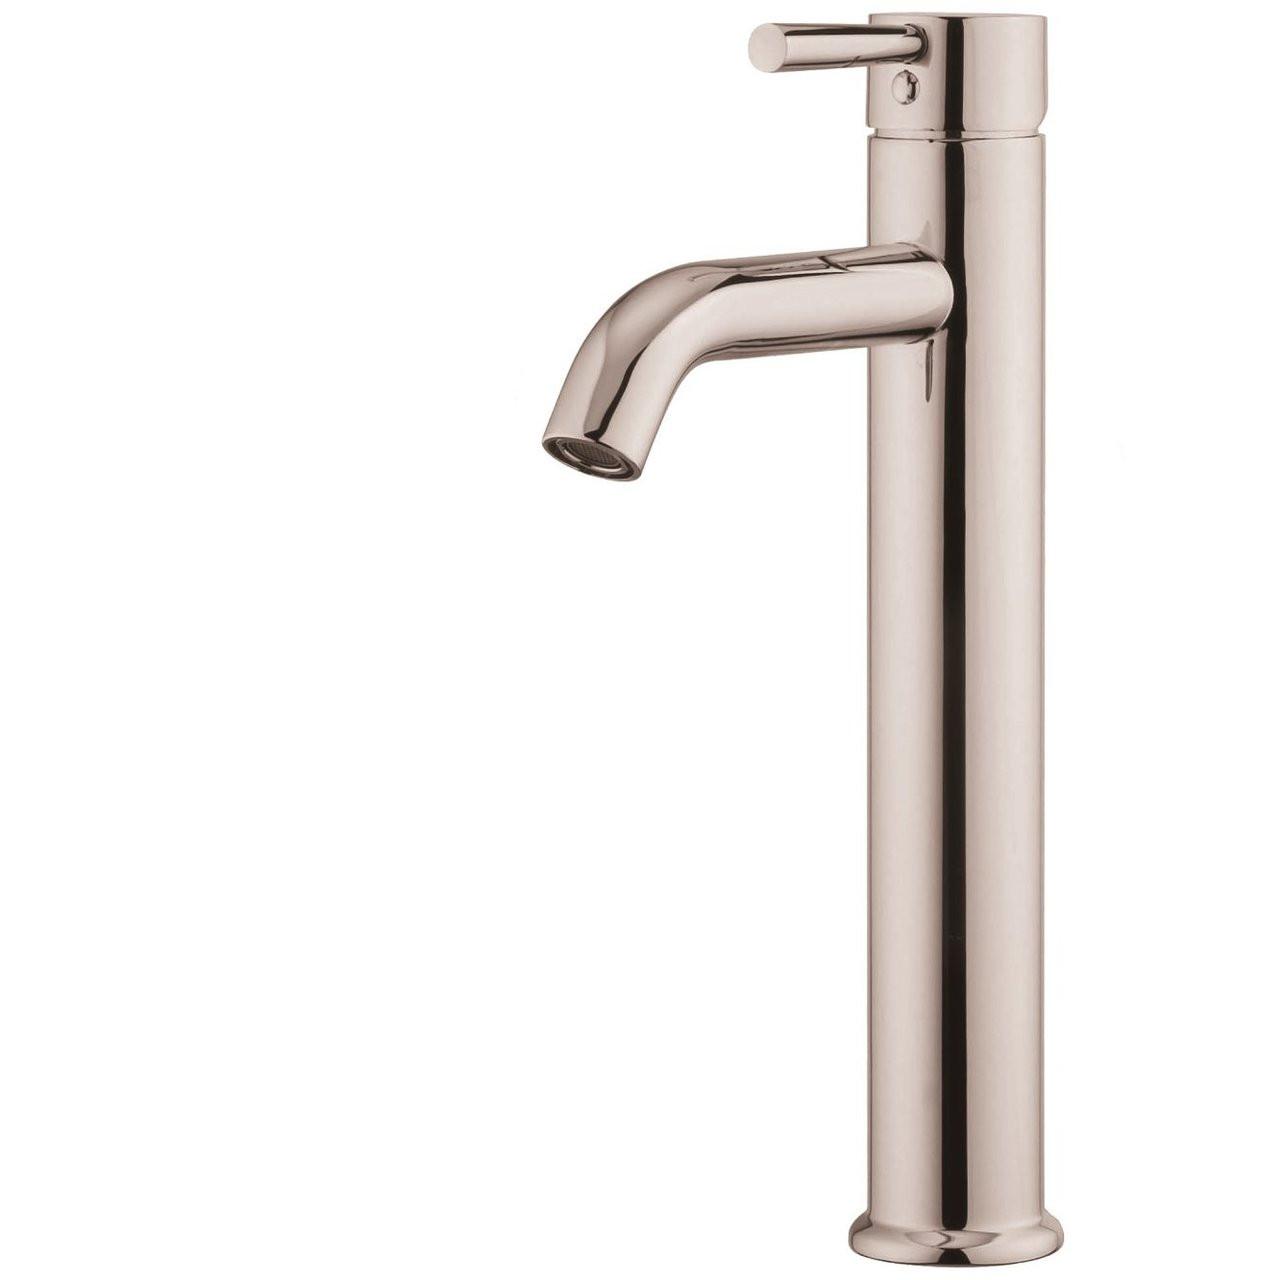 Vanity Art VA10119A1-BN Single Handle Bathroom Vessel Faucet with ...